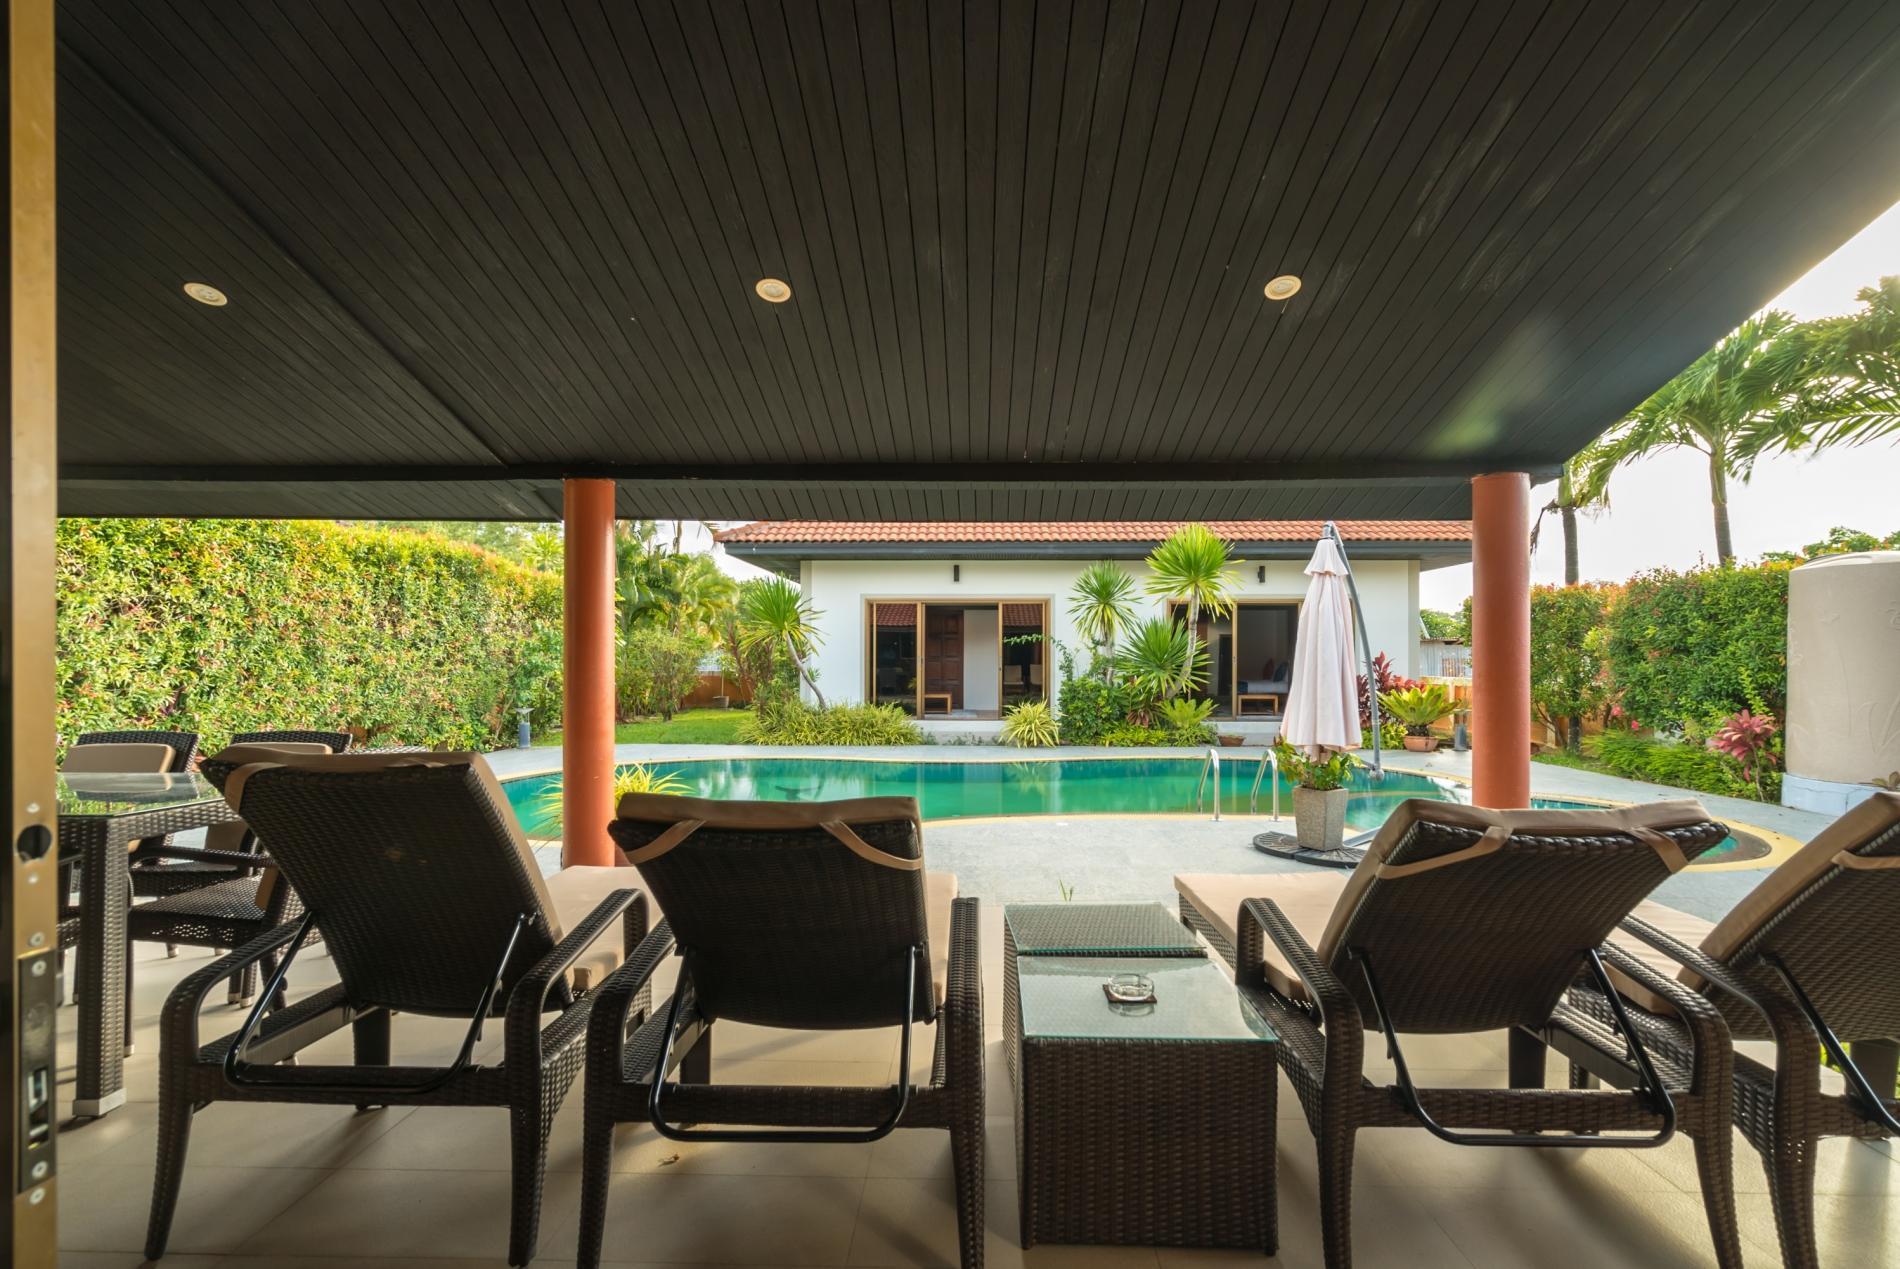 Apartment Pasak soi 3 - Convenient pool villa in quiet location  near Laguna  Boat avenue photo 19383683